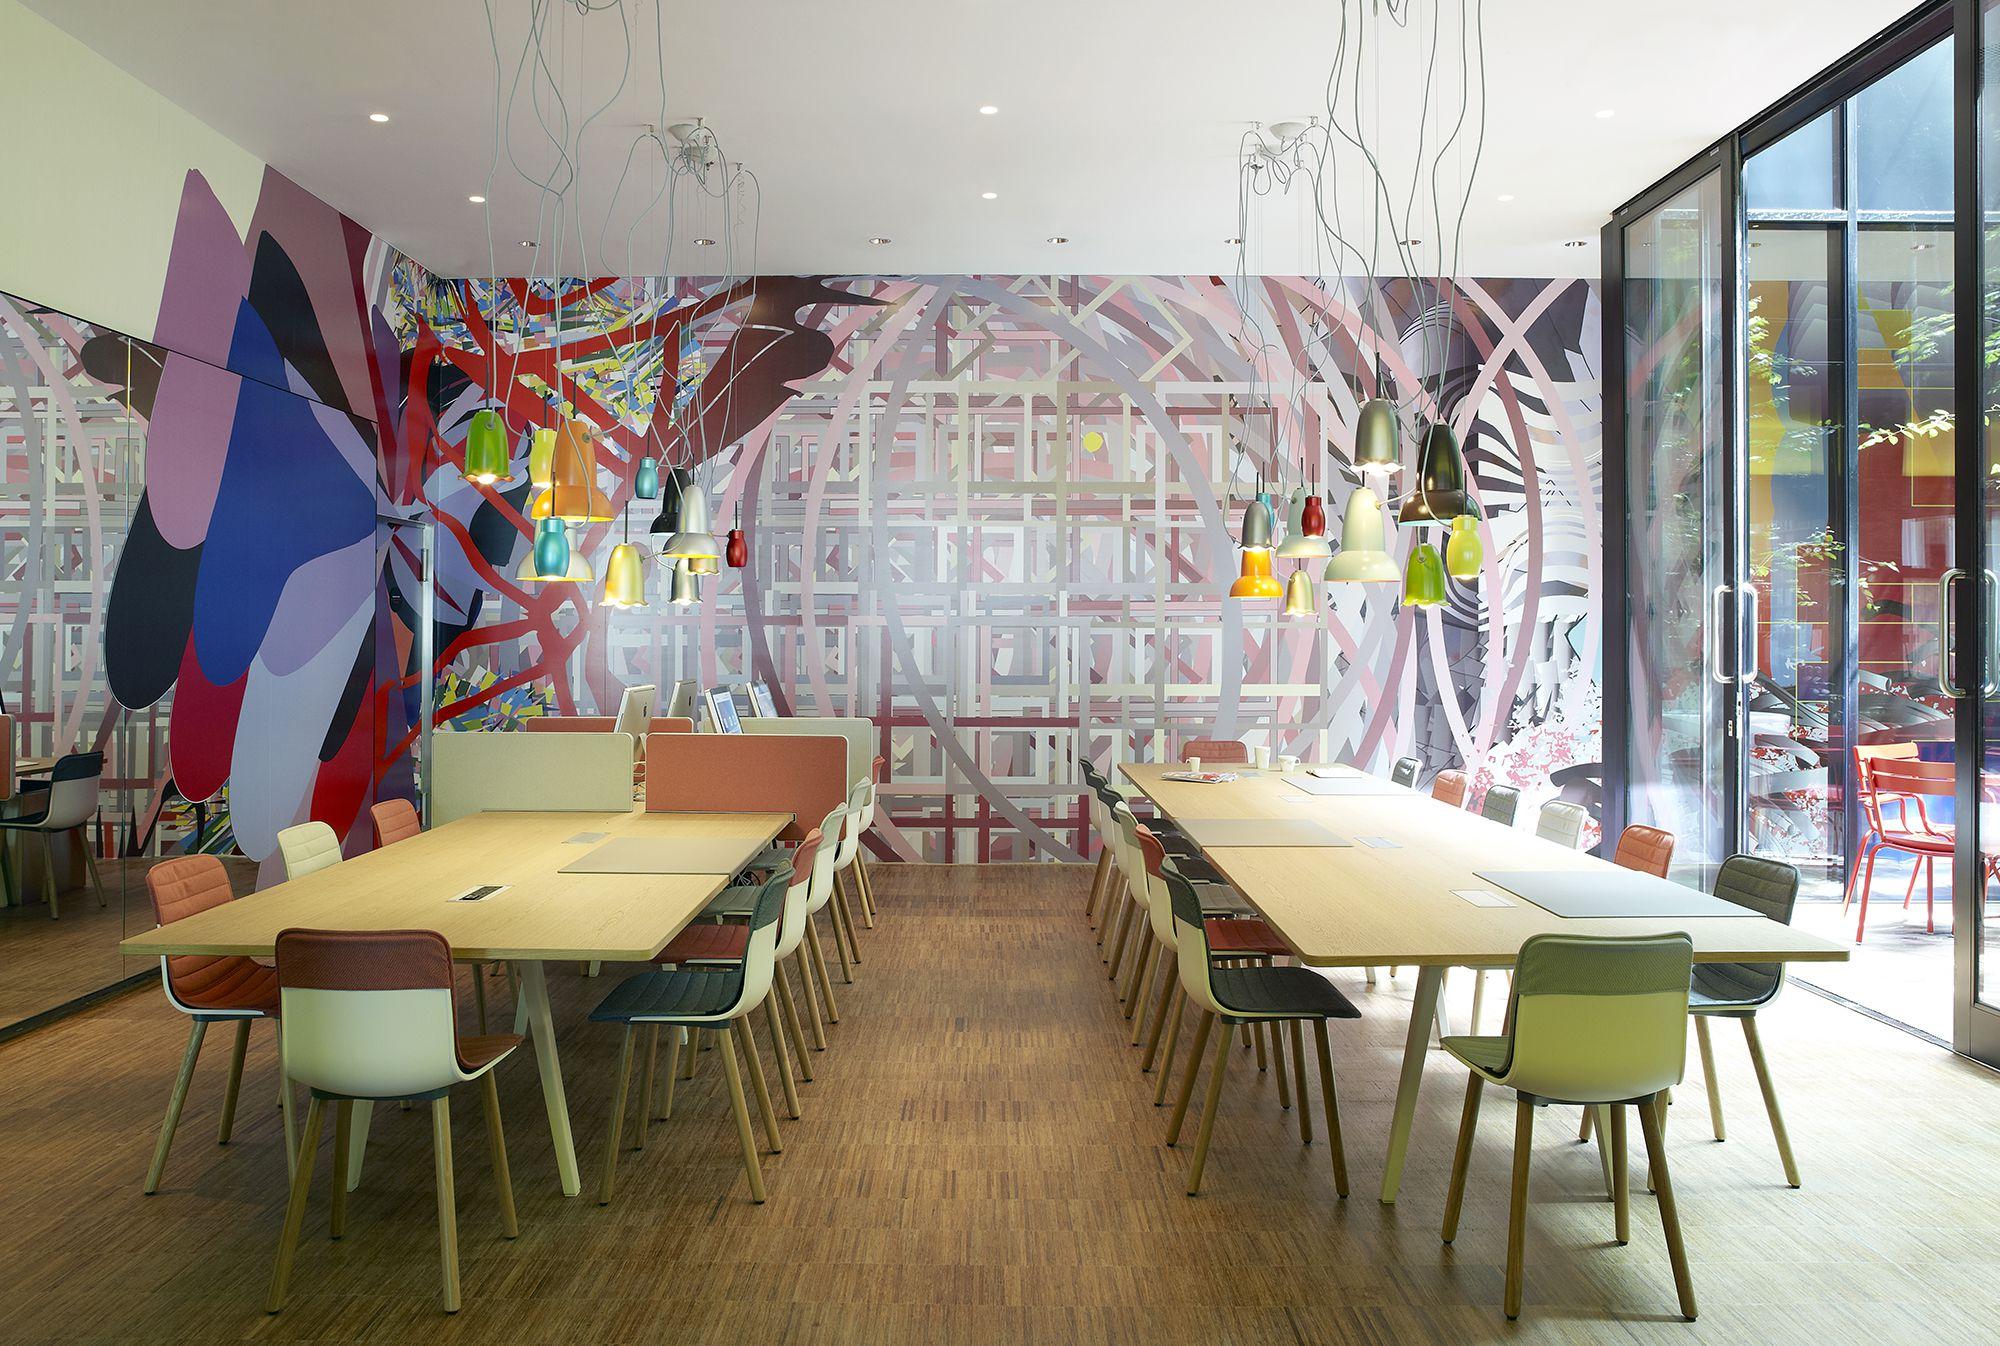 Design Hotel Citizenm London: London Bankside